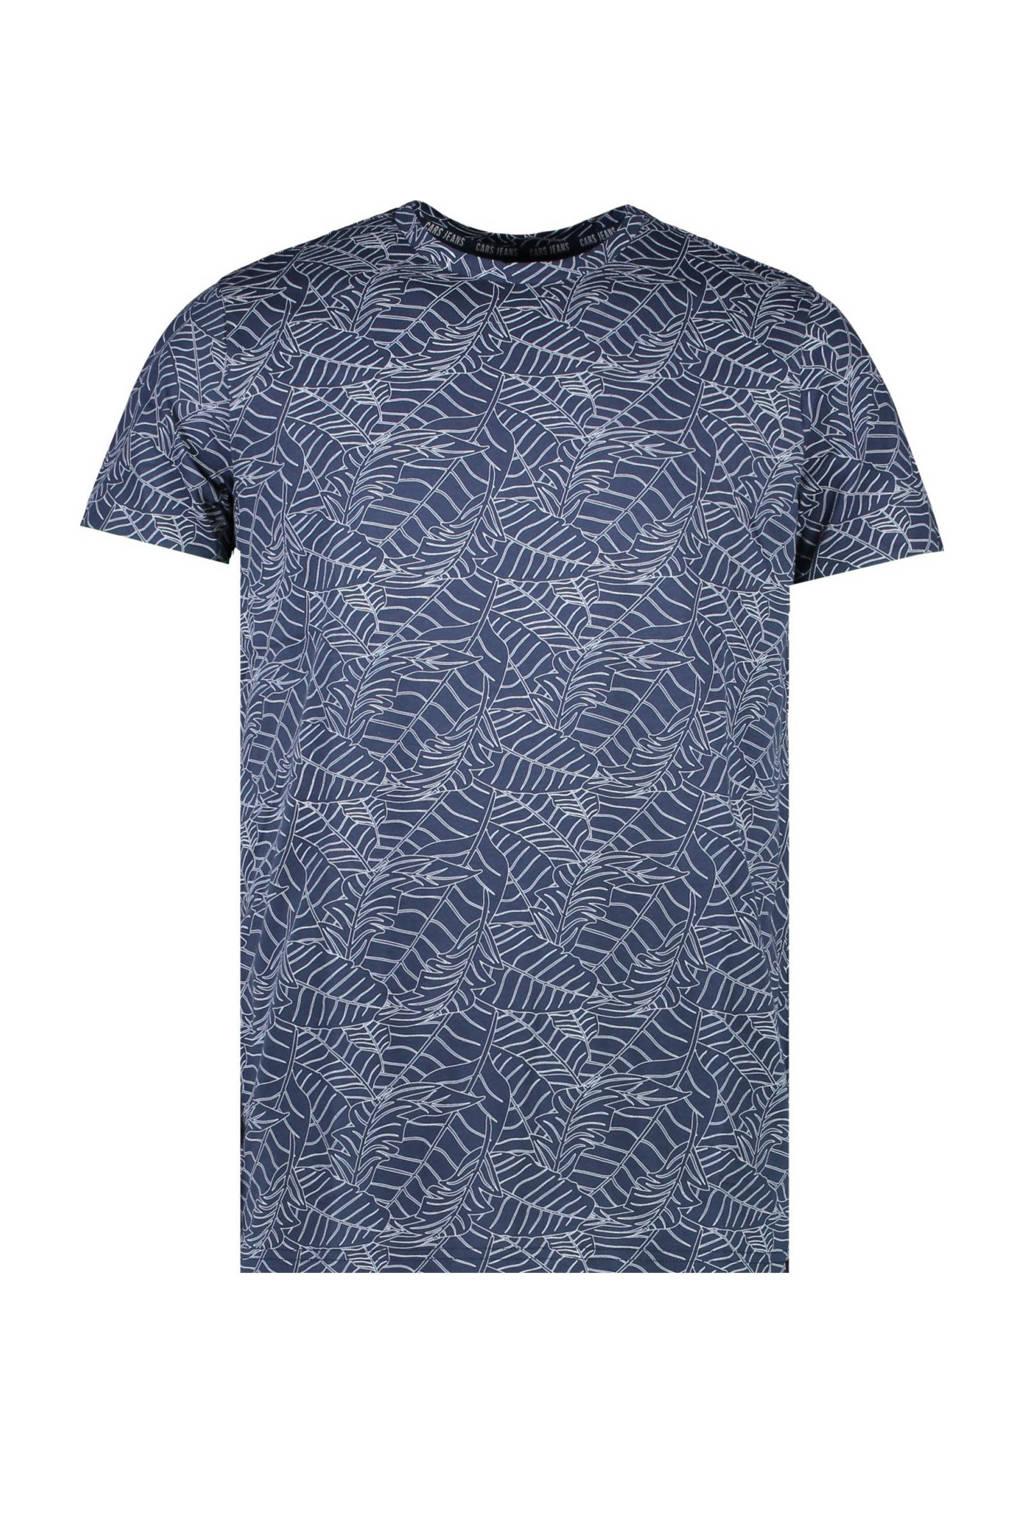 Cars T-shirt Kahu met all over print donkerblauw, Donkerblauw